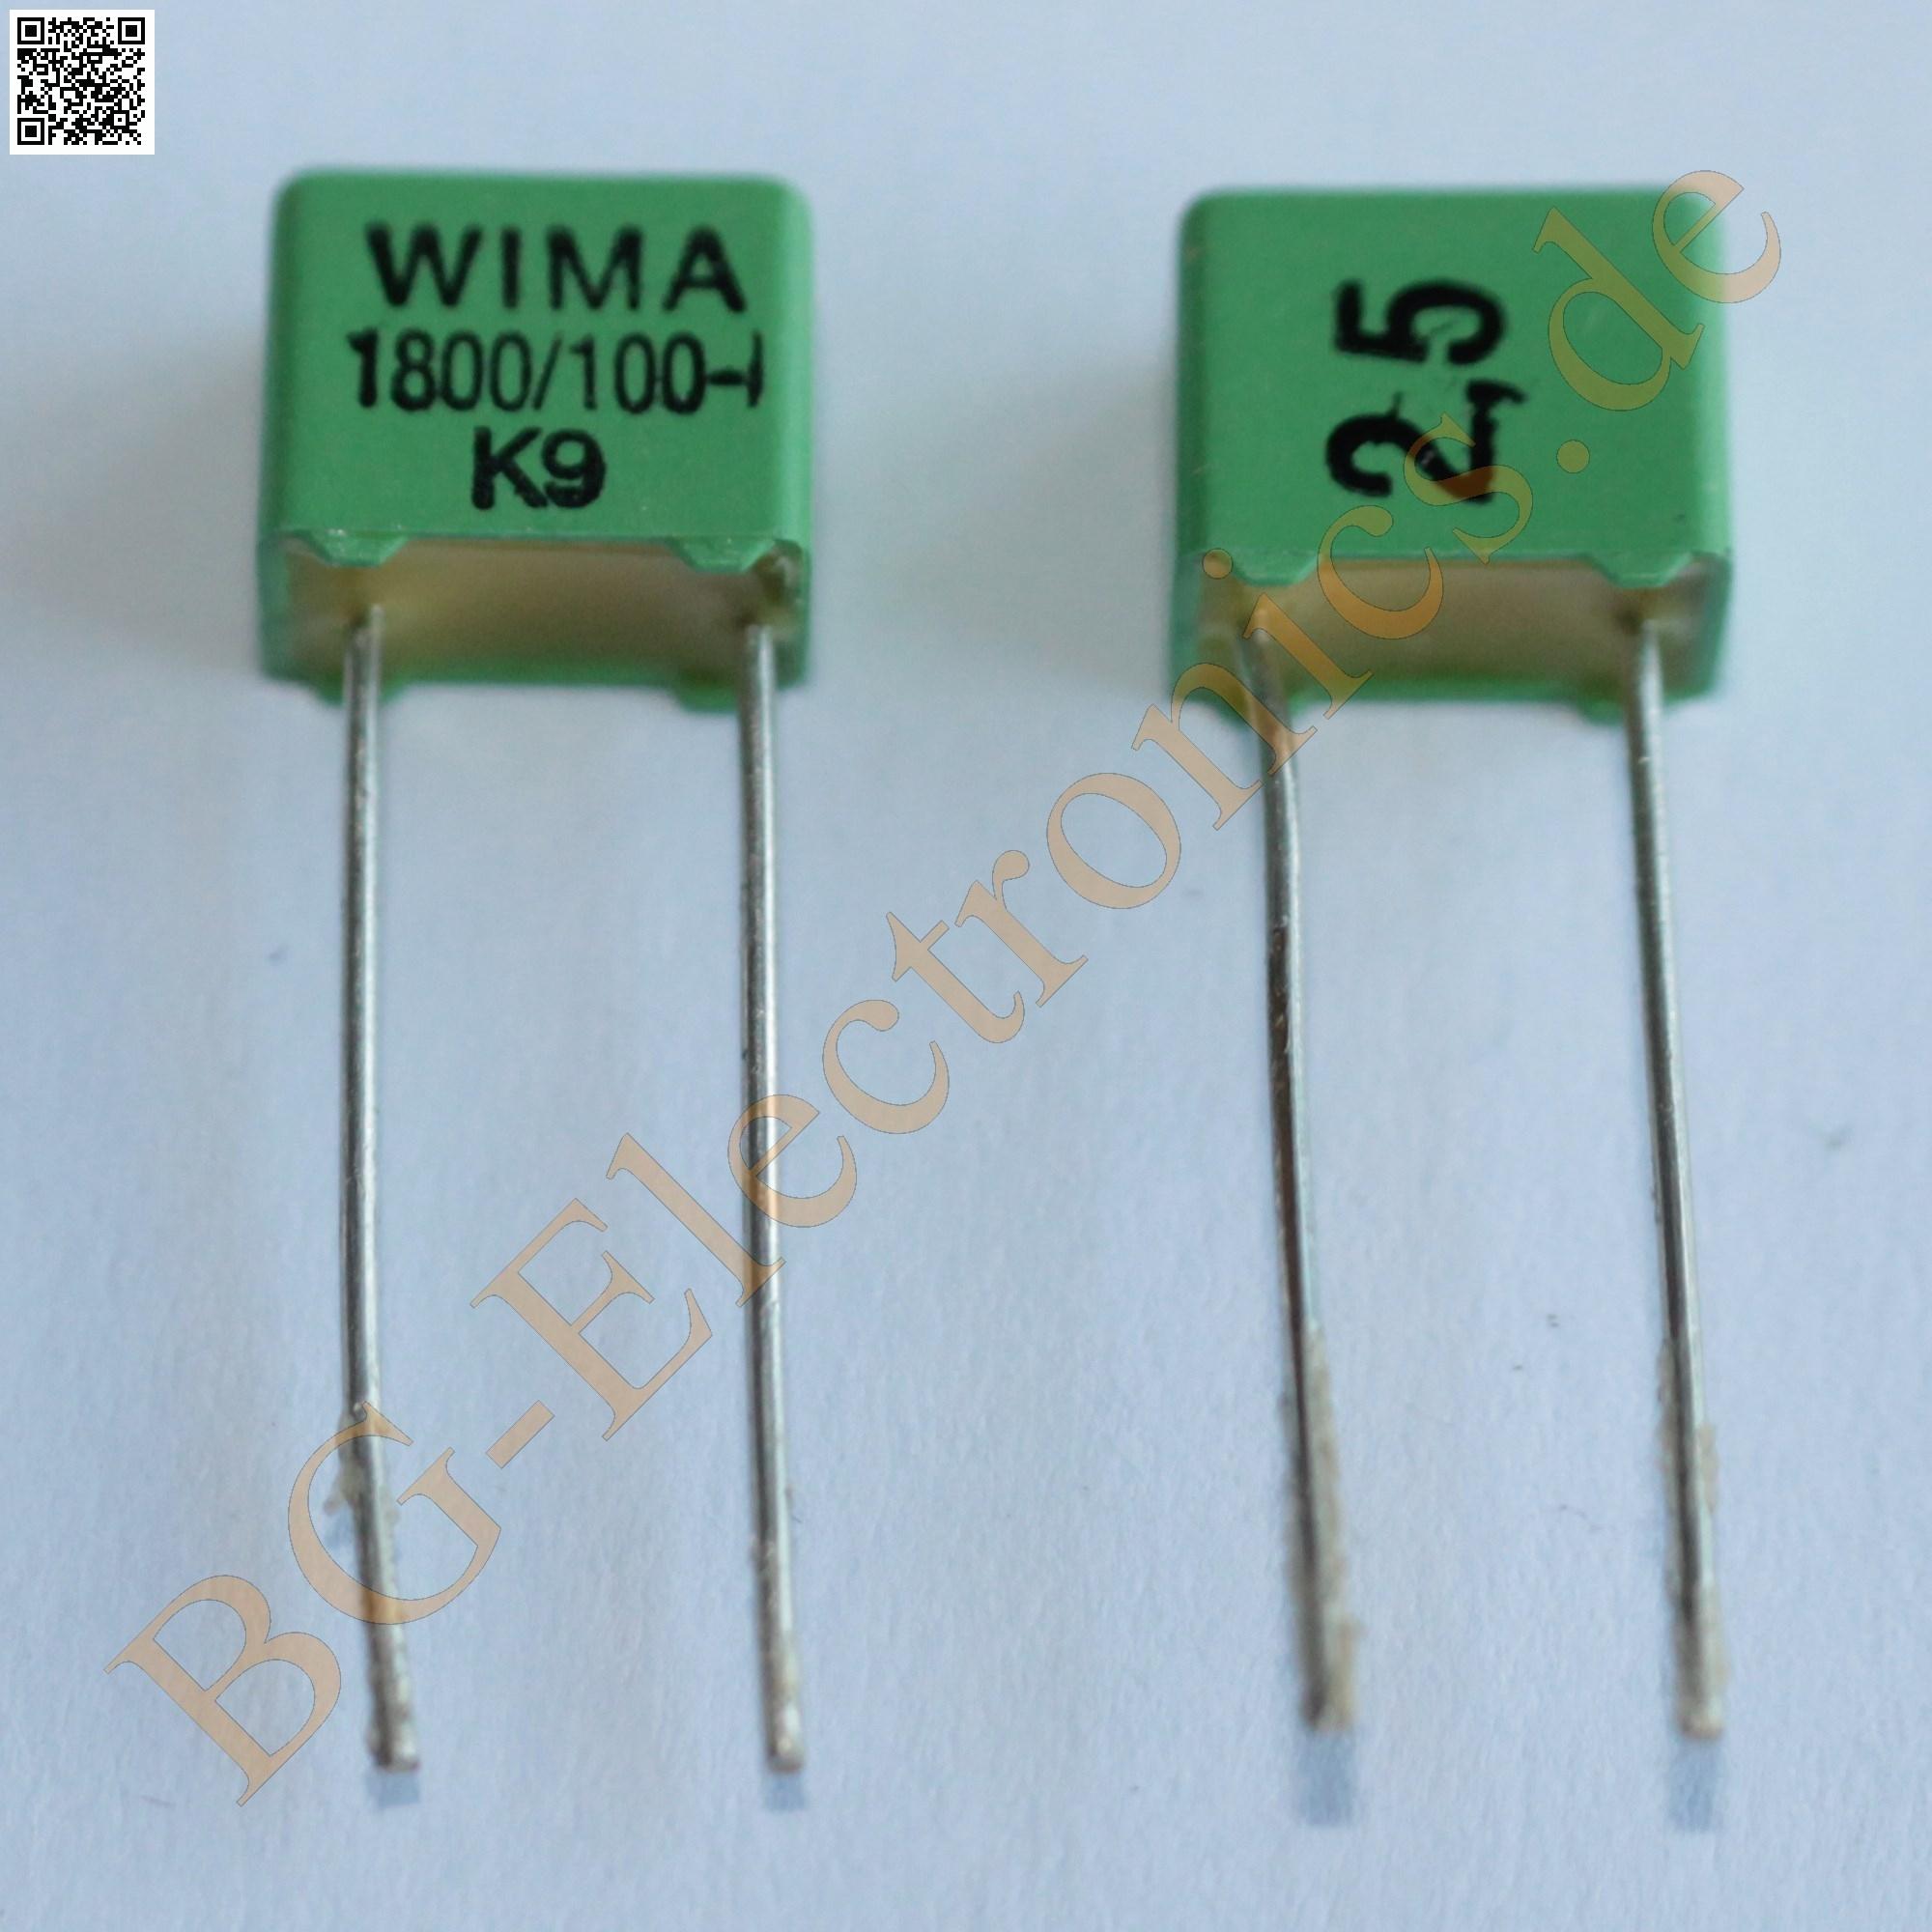 50 x 1800pf 100v fkp 2 rm5 folien kondensator capacitor wima 50pcs ebay. Black Bedroom Furniture Sets. Home Design Ideas